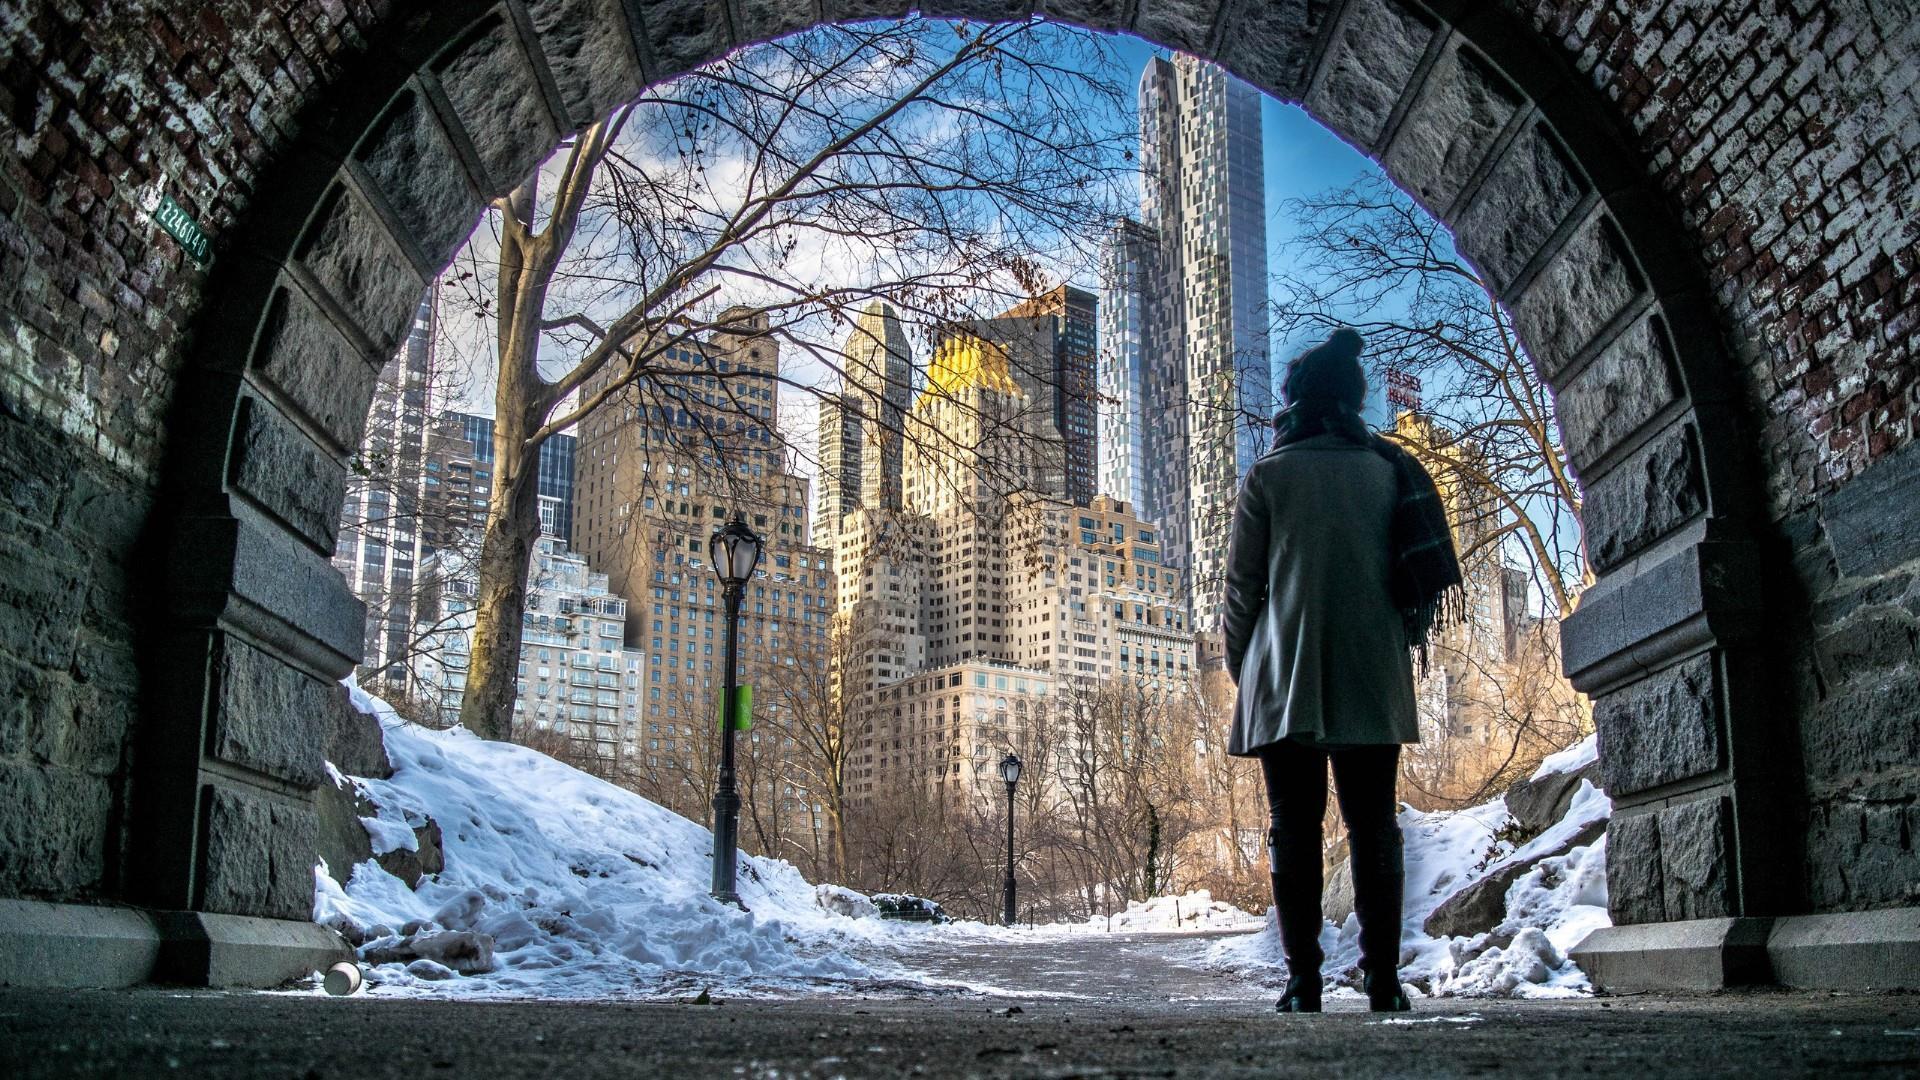 New York Winter Central Park 1970240 Hd Wallpaper